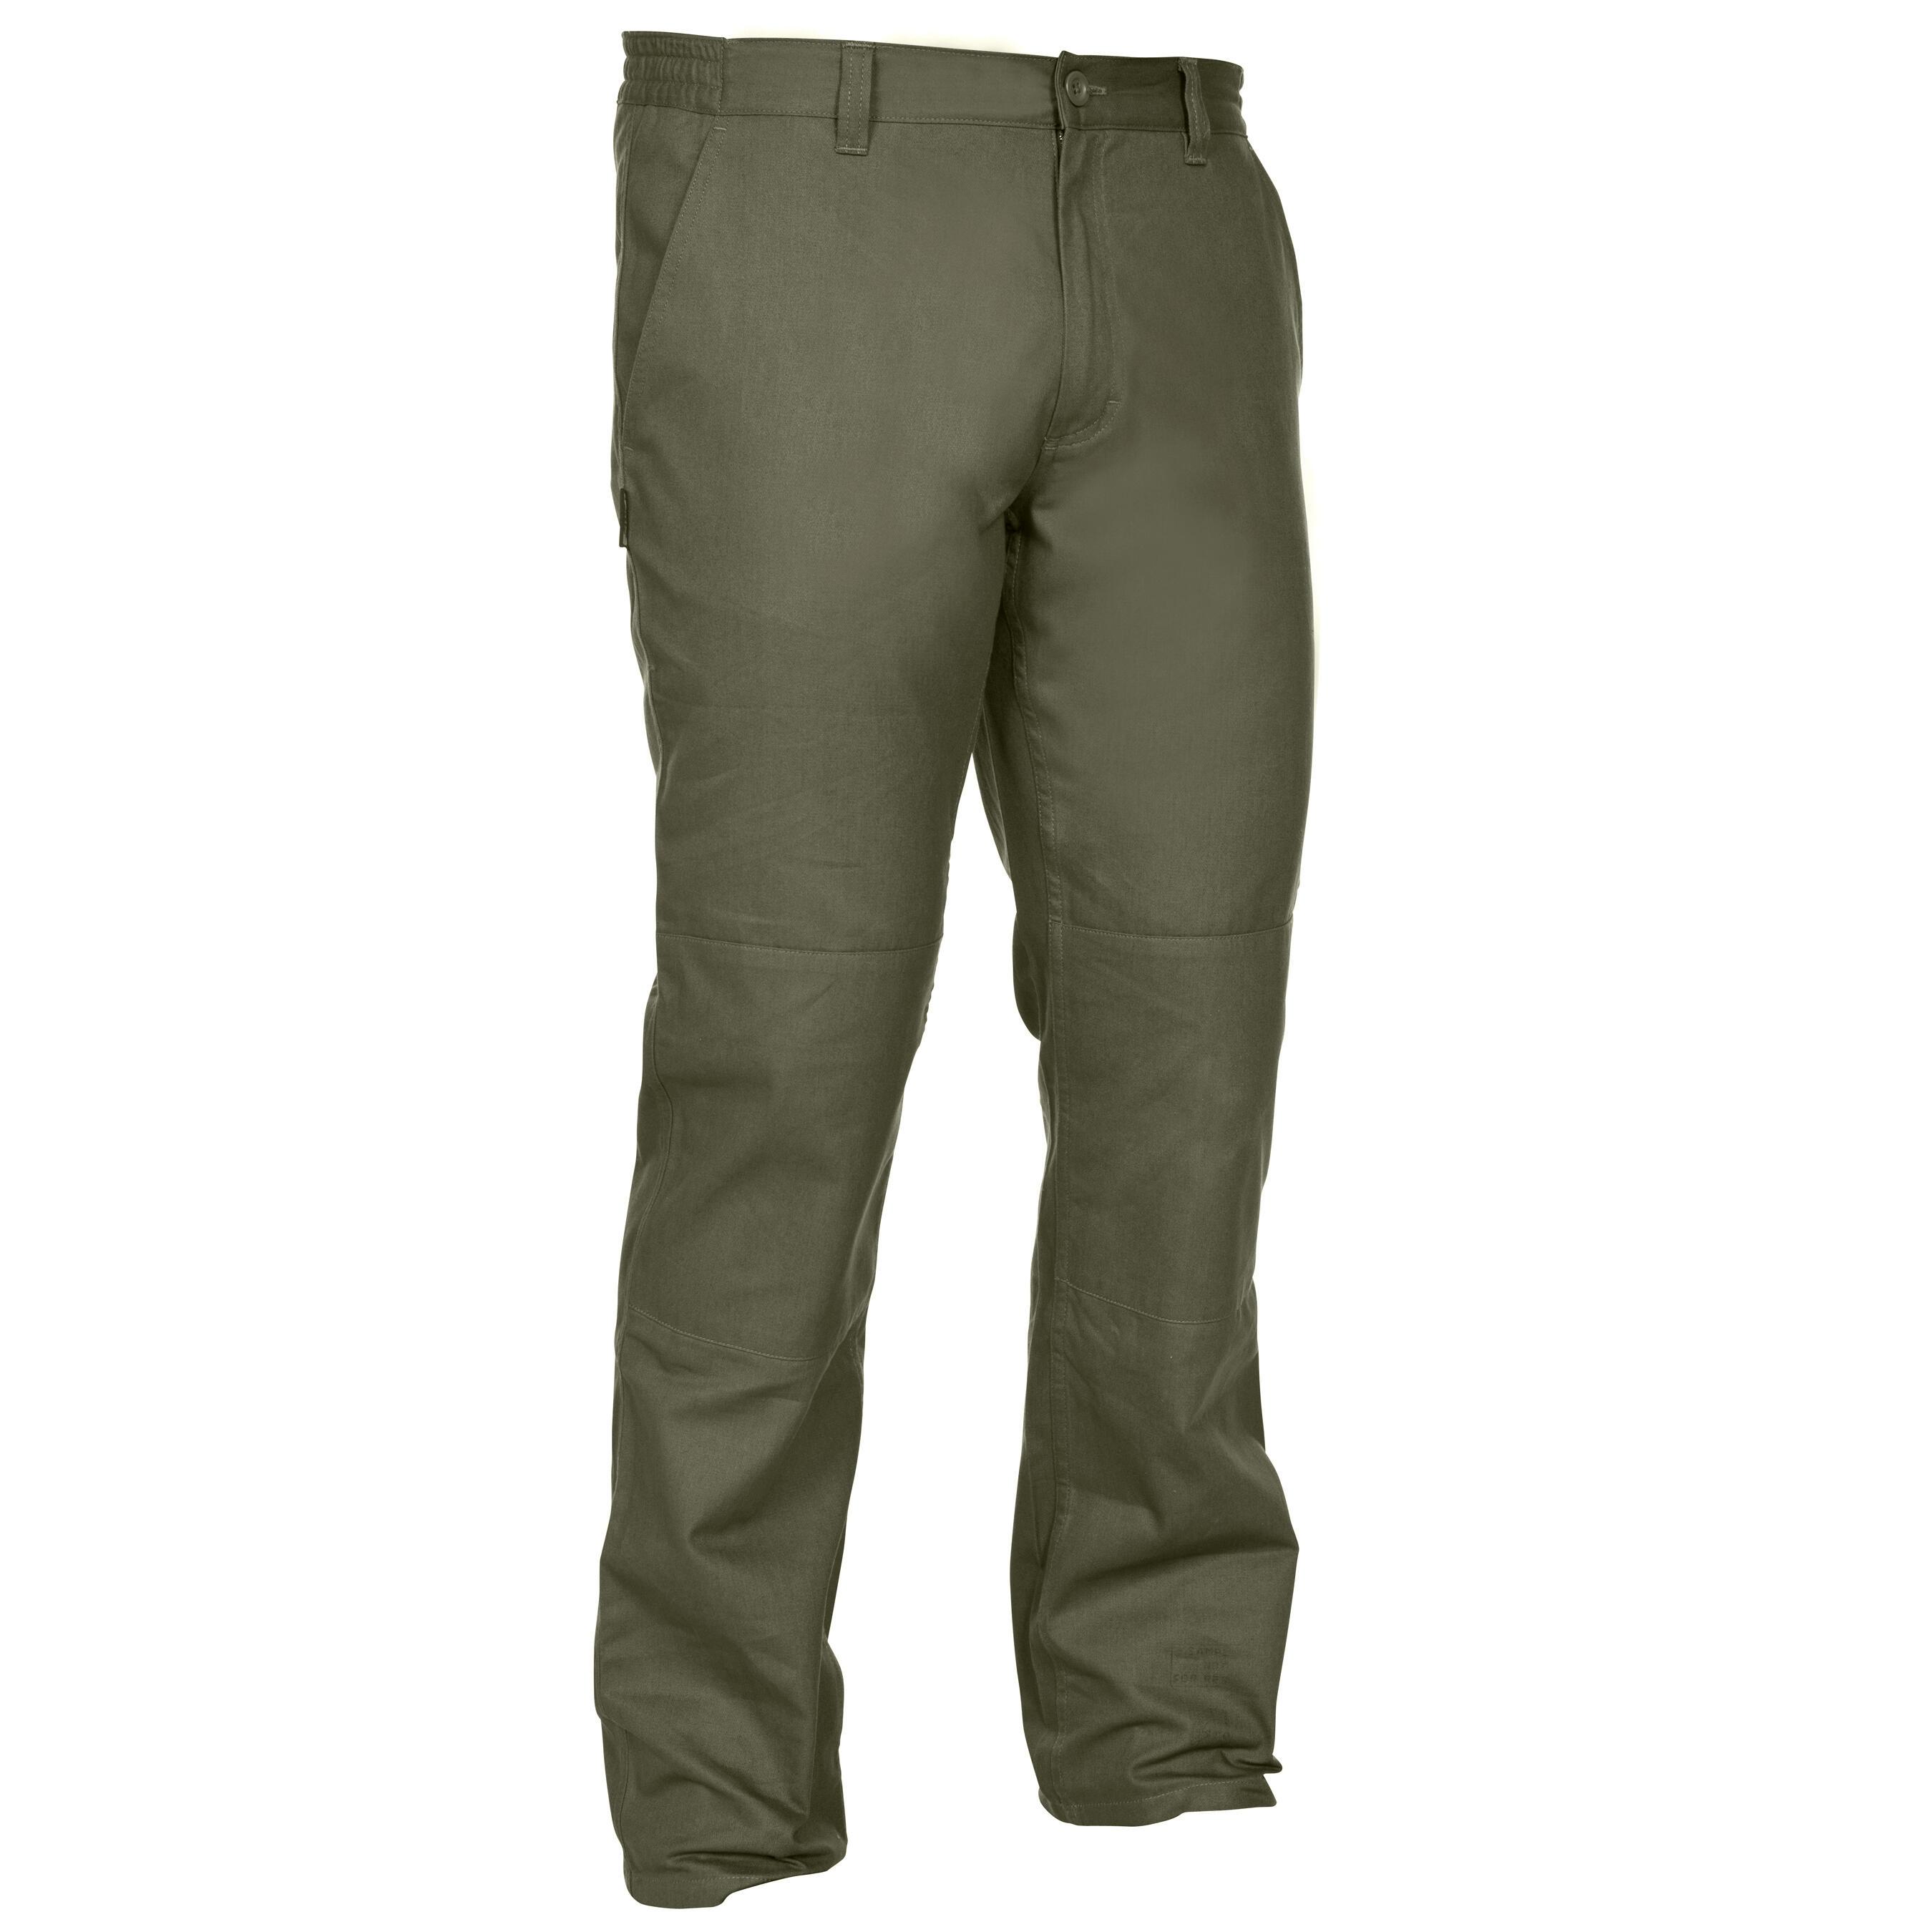 Pantalon chasse Steppe 100 vert